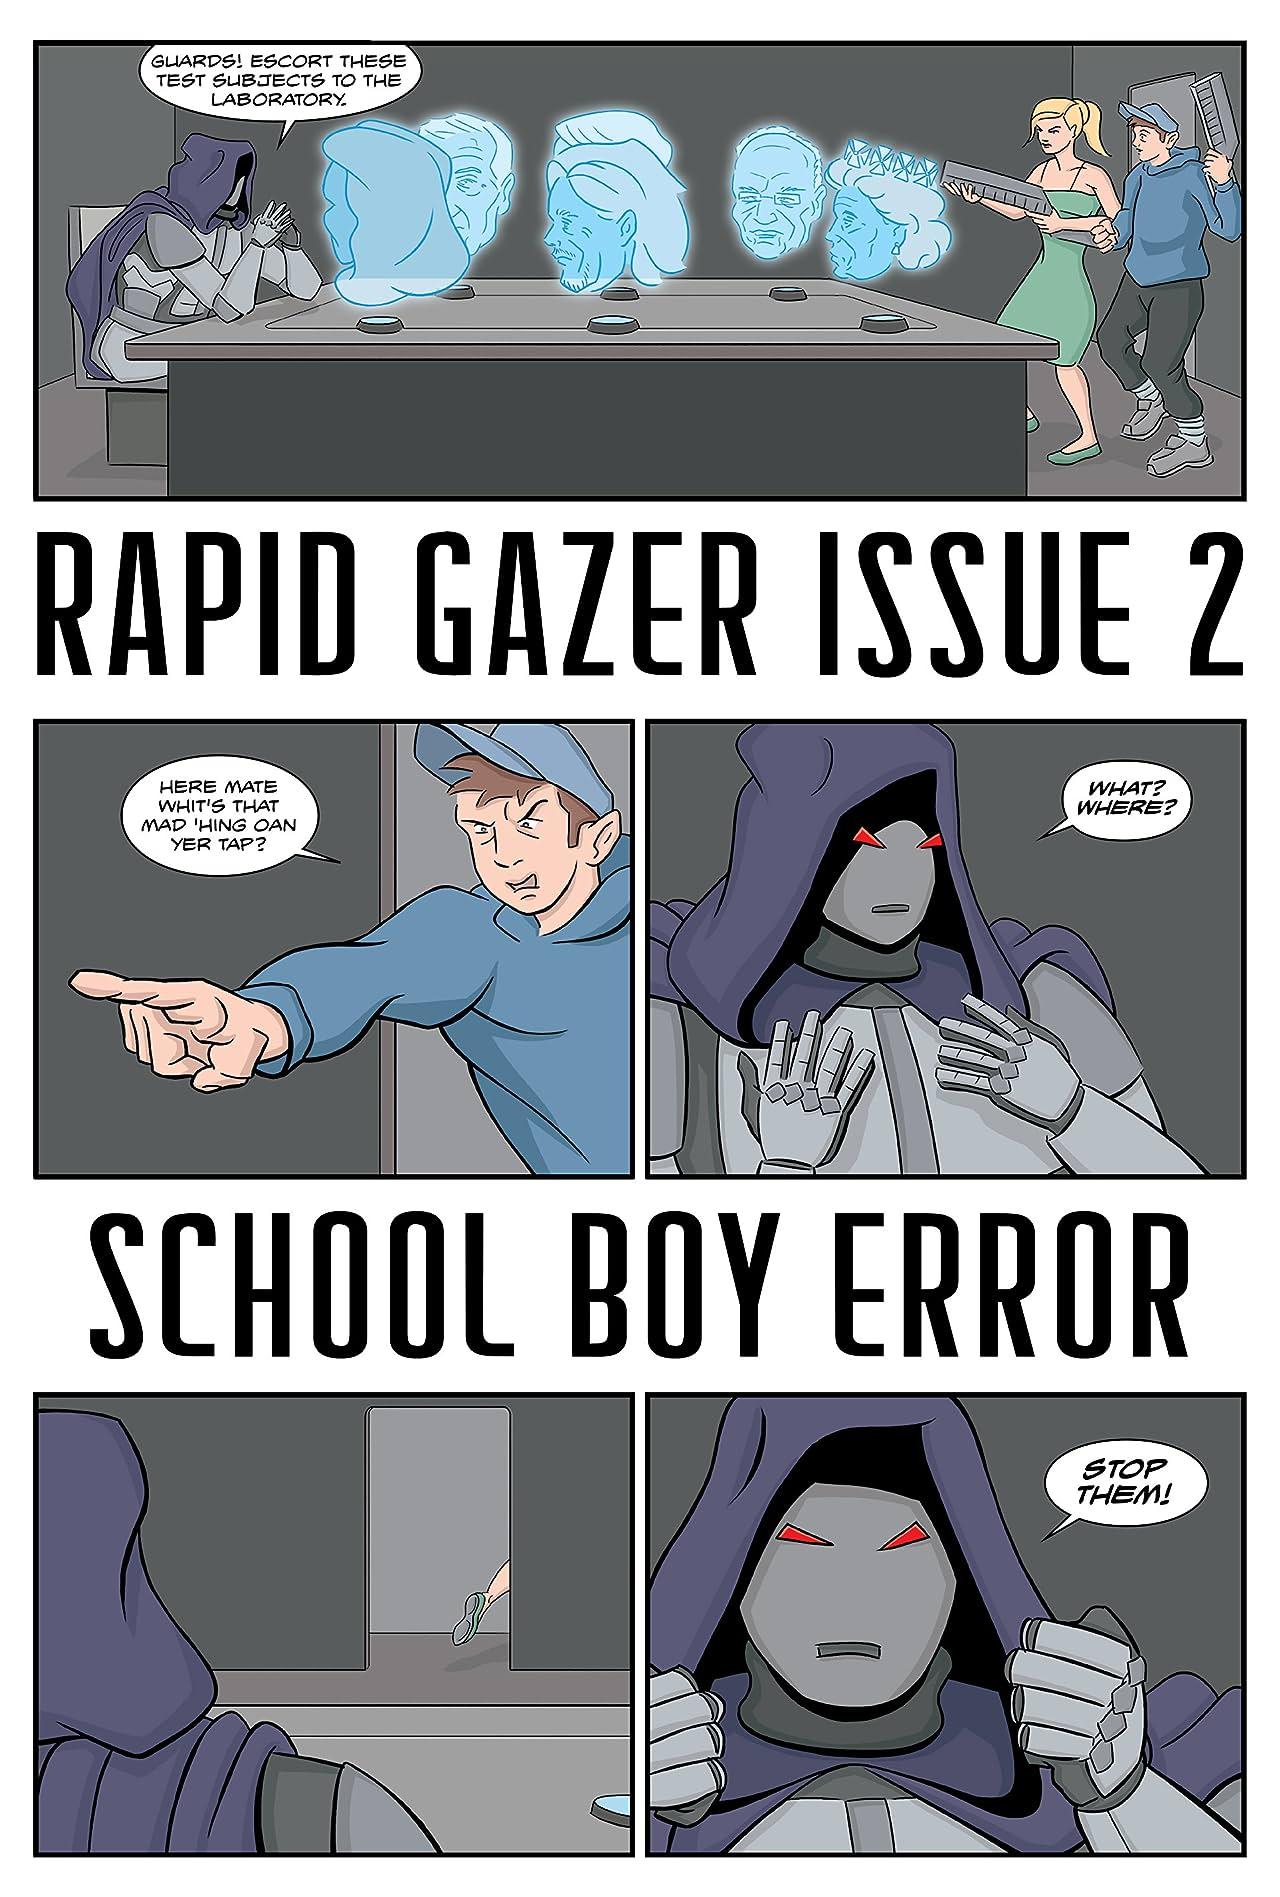 Rapid Gazzer #2